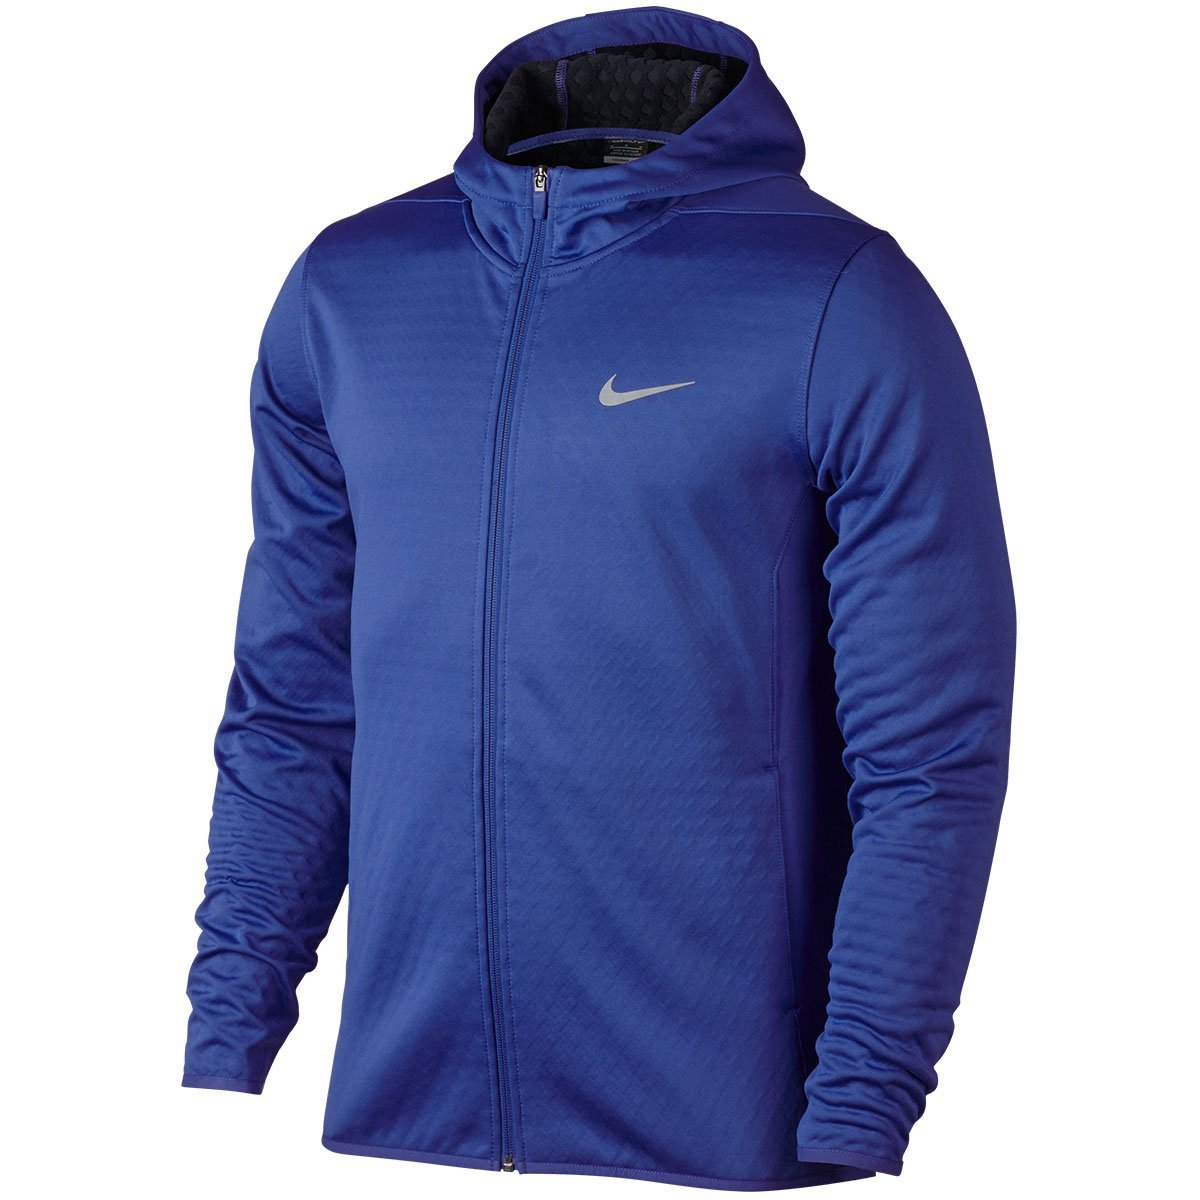 b34a856073b59 Get Quotations · Men's Nike Tech Sphere Full-Zip Golf Hoodie-801972-480-L